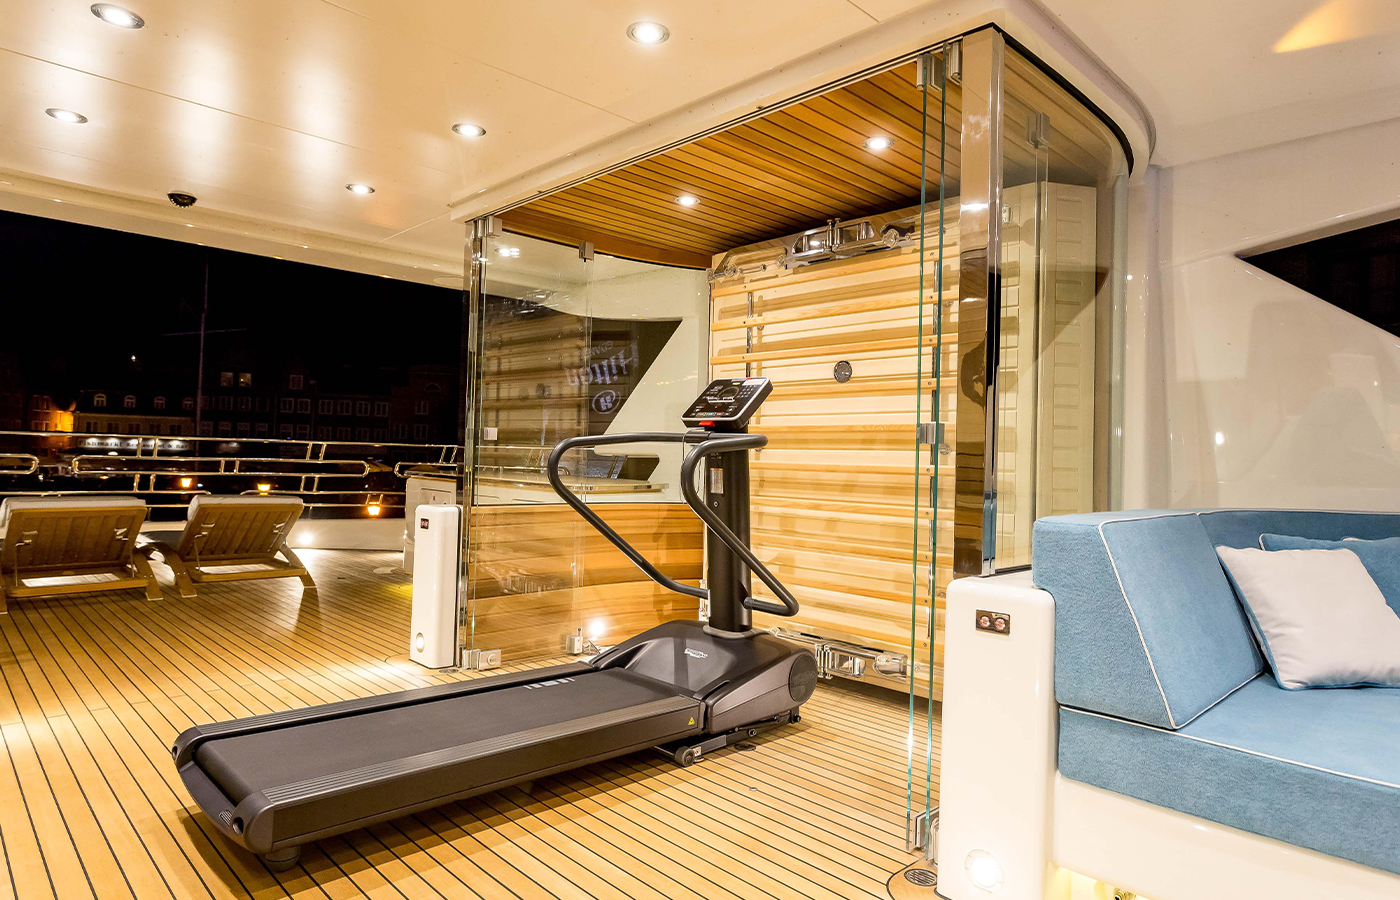 Sauna + Gym